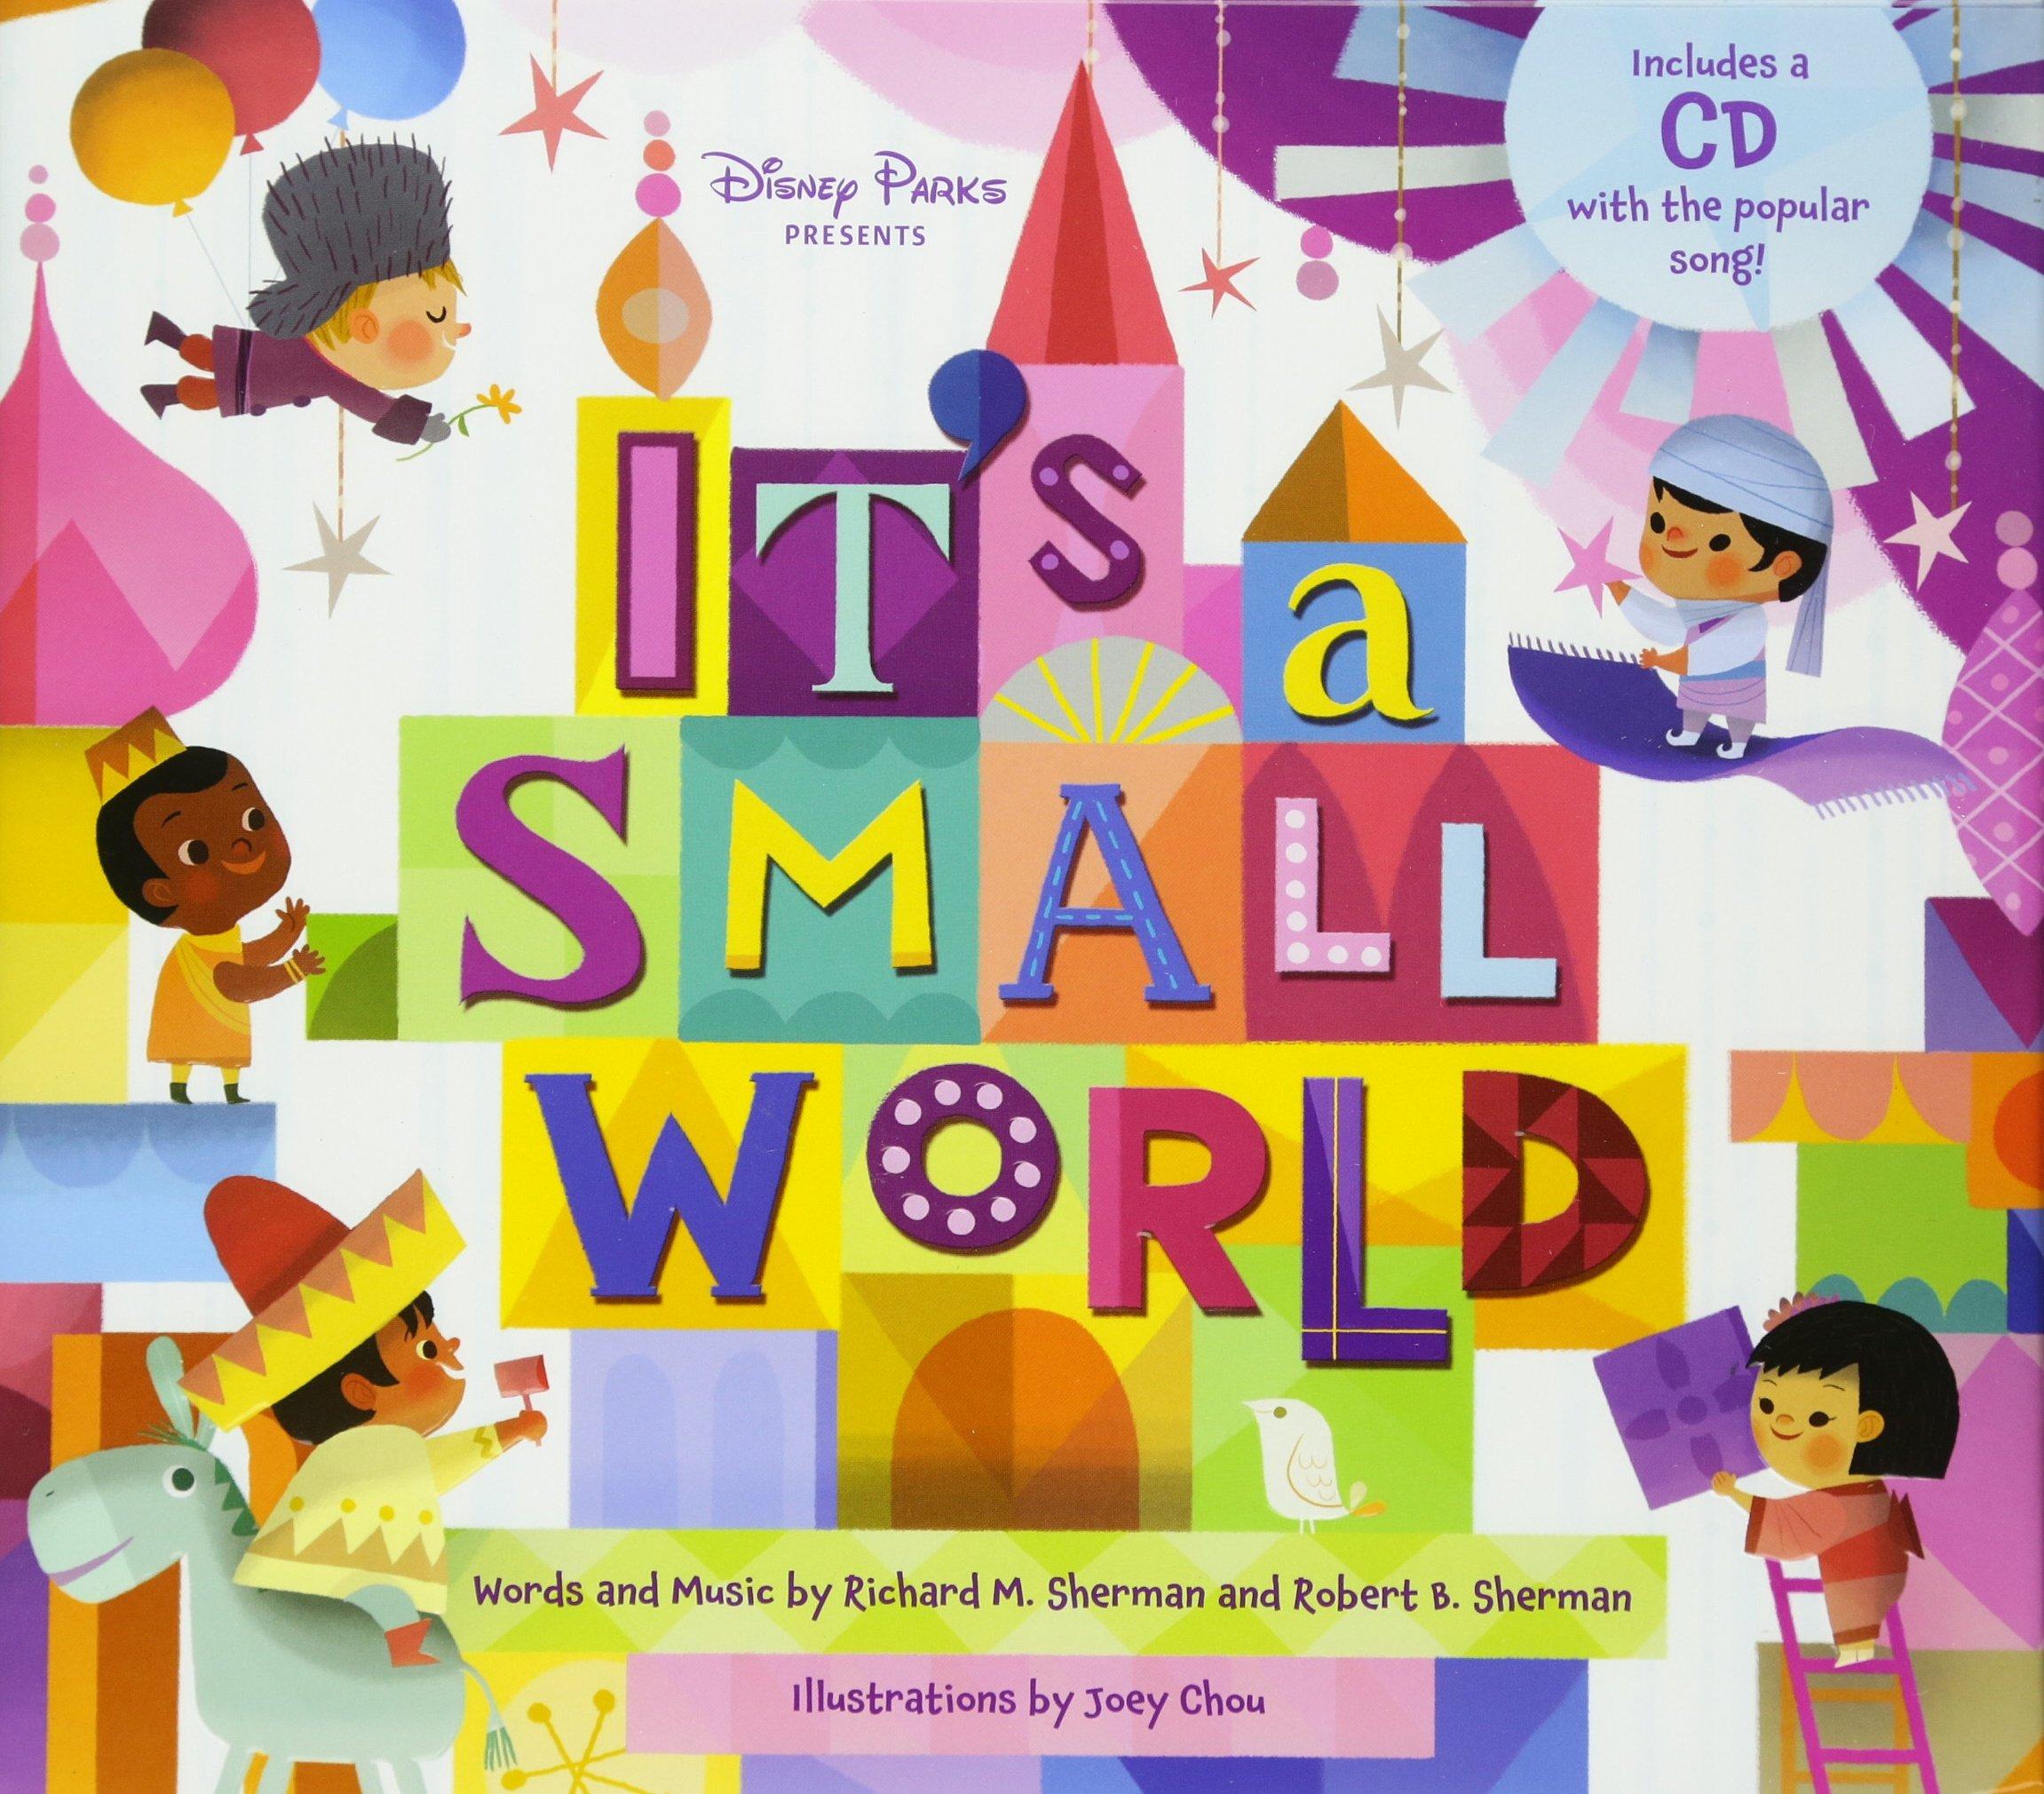 amazon it s a small world disney parks presents richard m